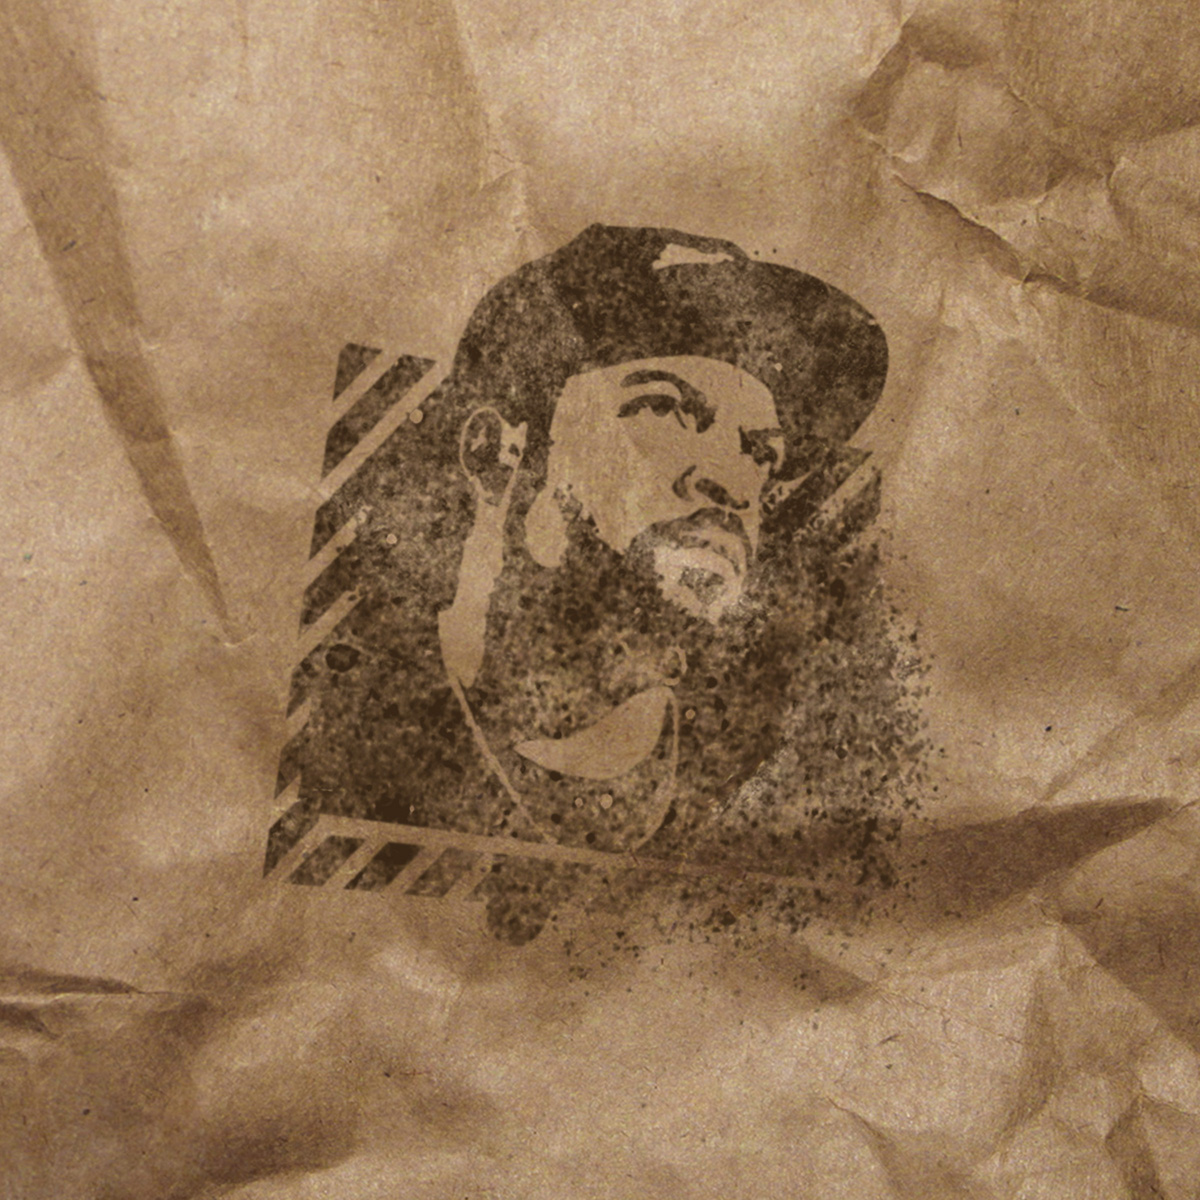 JMR_Stamps_0008_Ice Cube.jpg